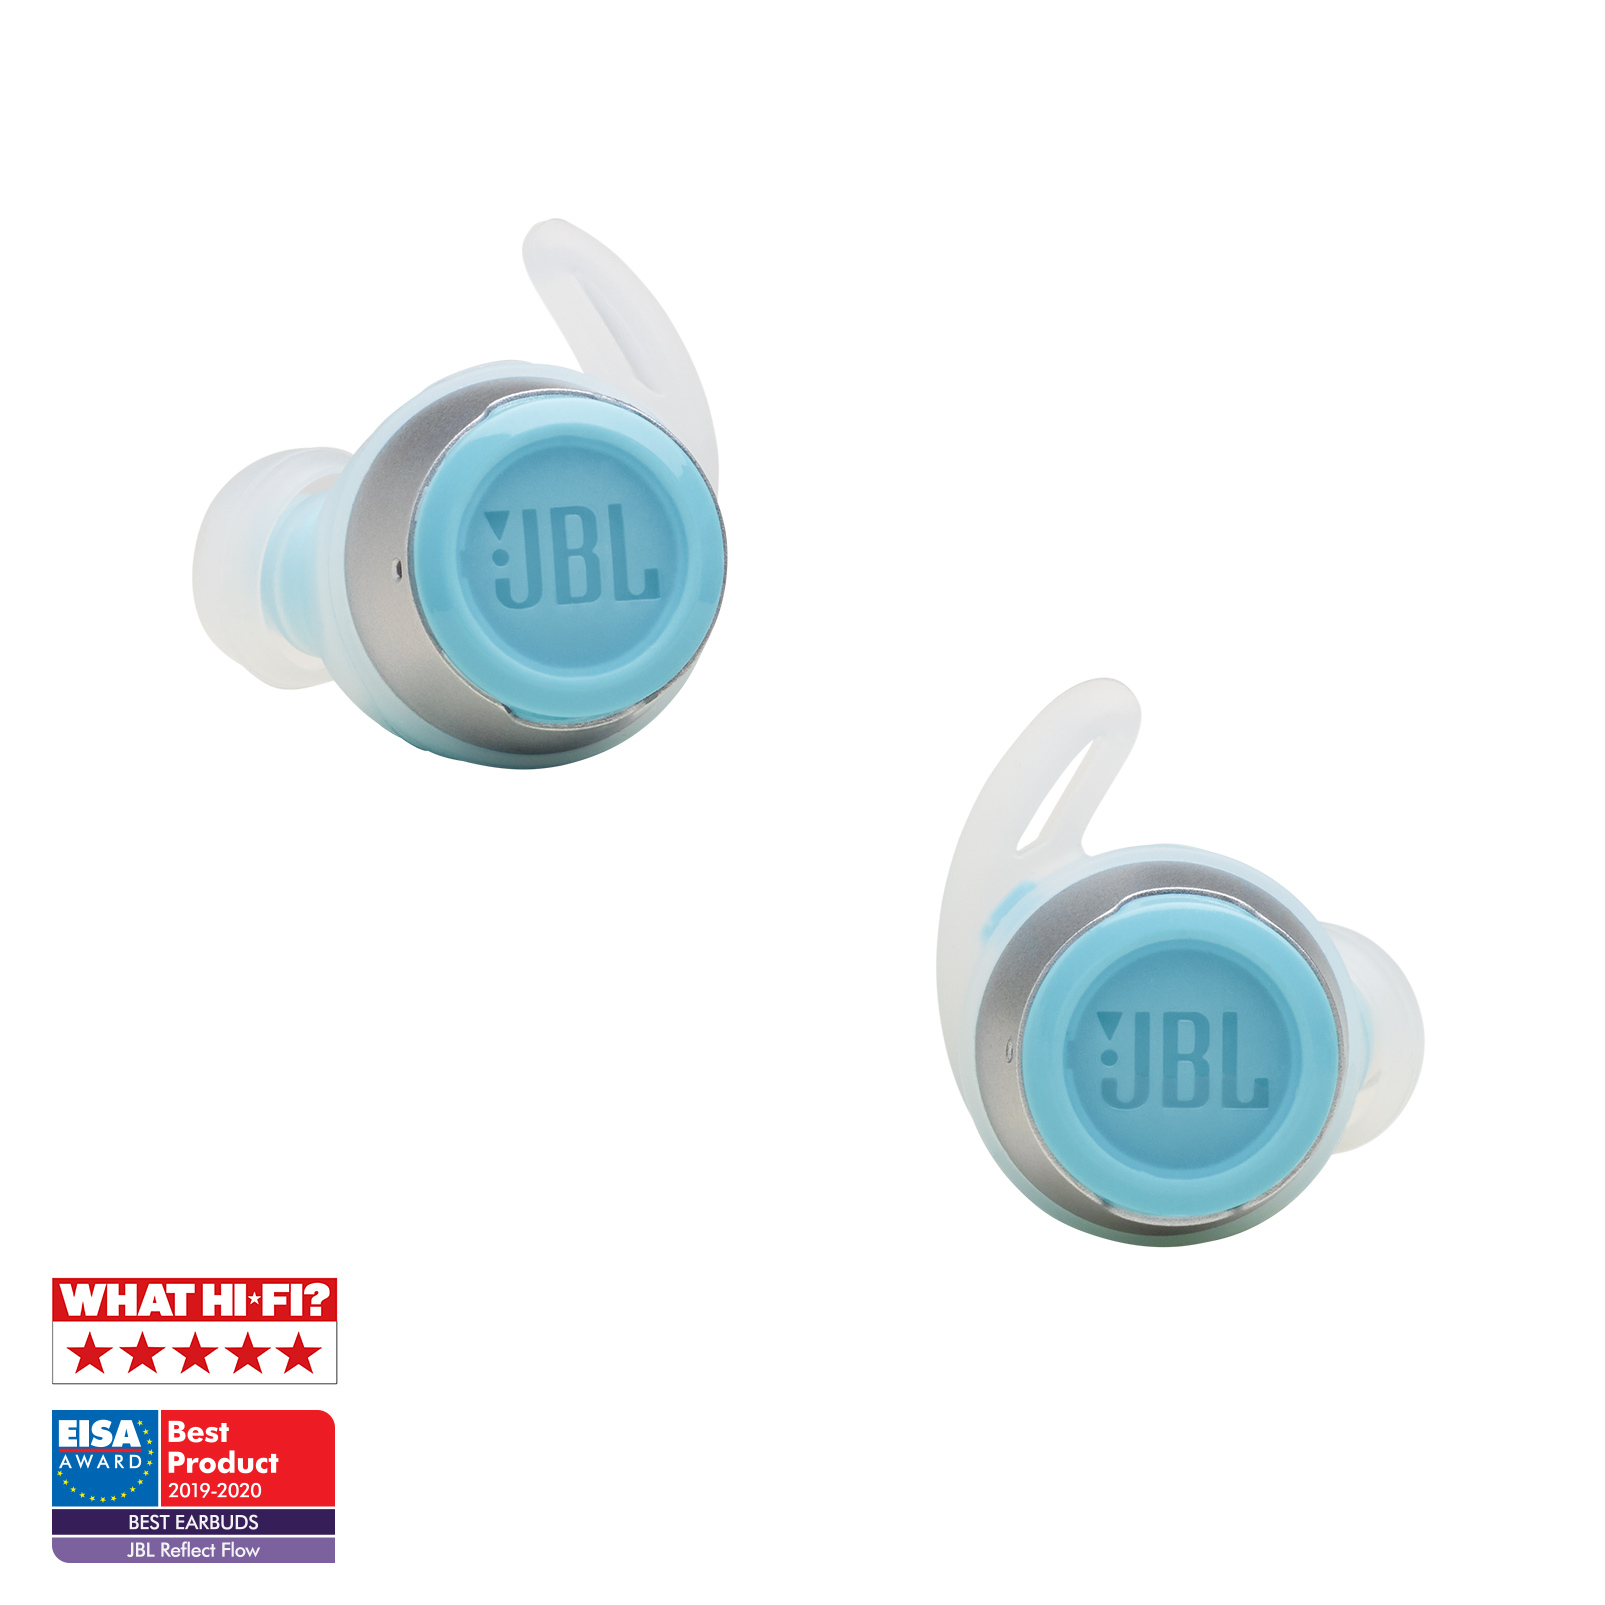 JBL Reflect Flow - Teal - True wireless sport headphones. - Detailshot 3